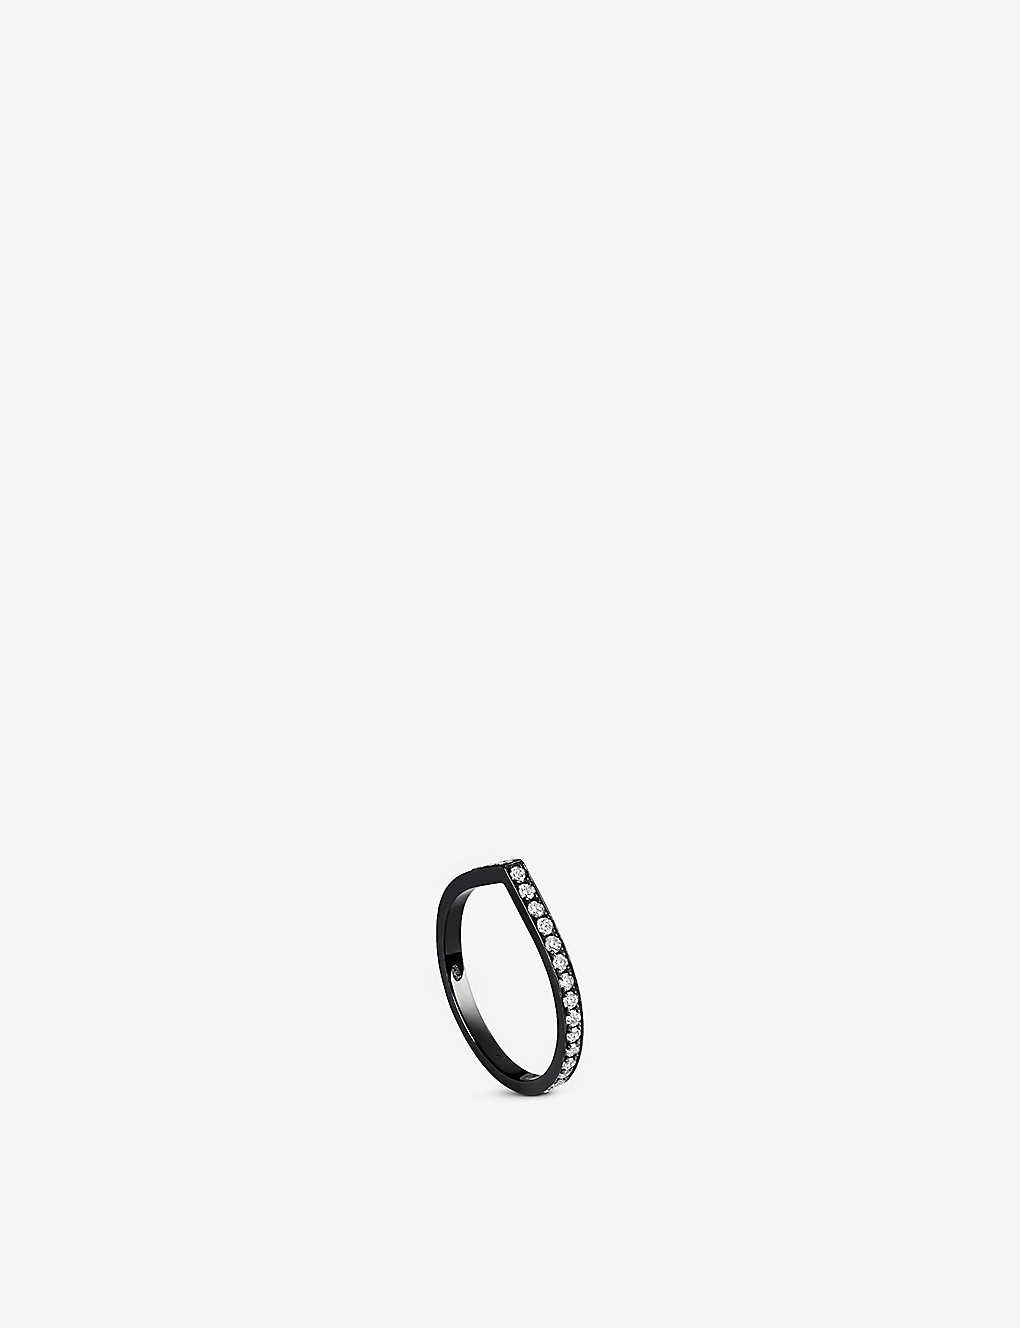 REPOSSI ANTIFER BLACK-GOLD AND DIAMOND RING